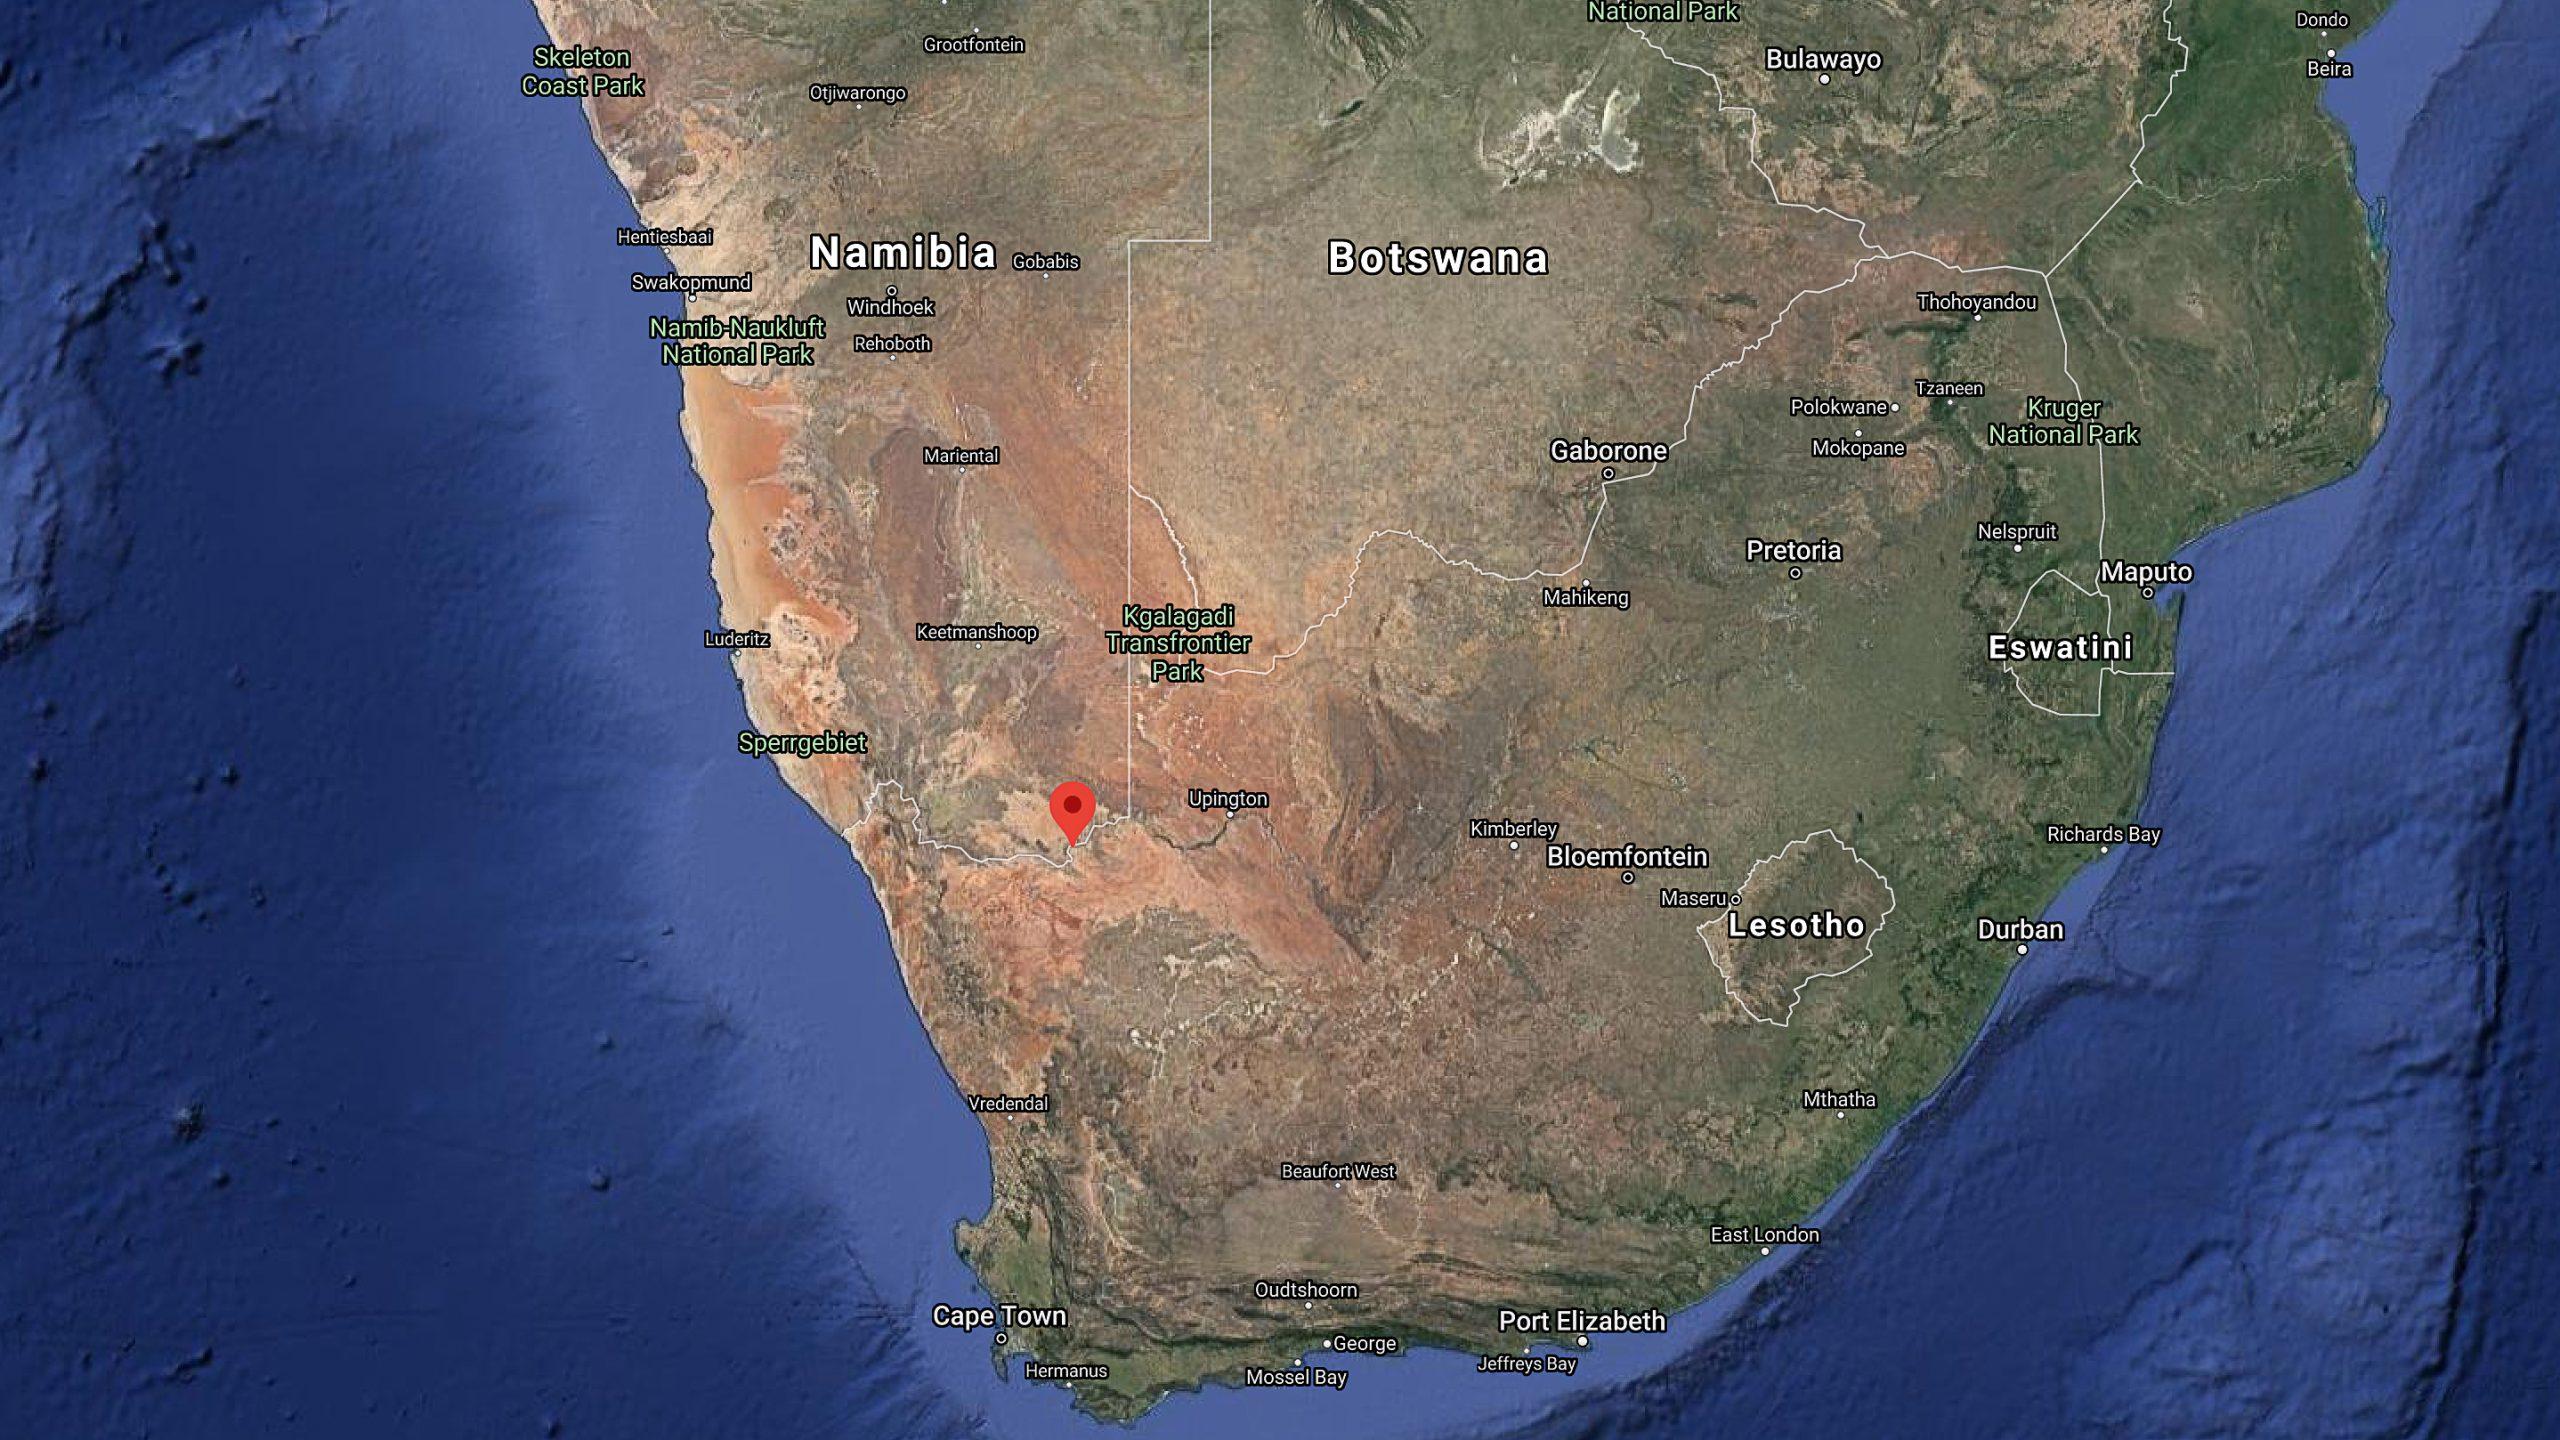 Onseepkans, South Africa